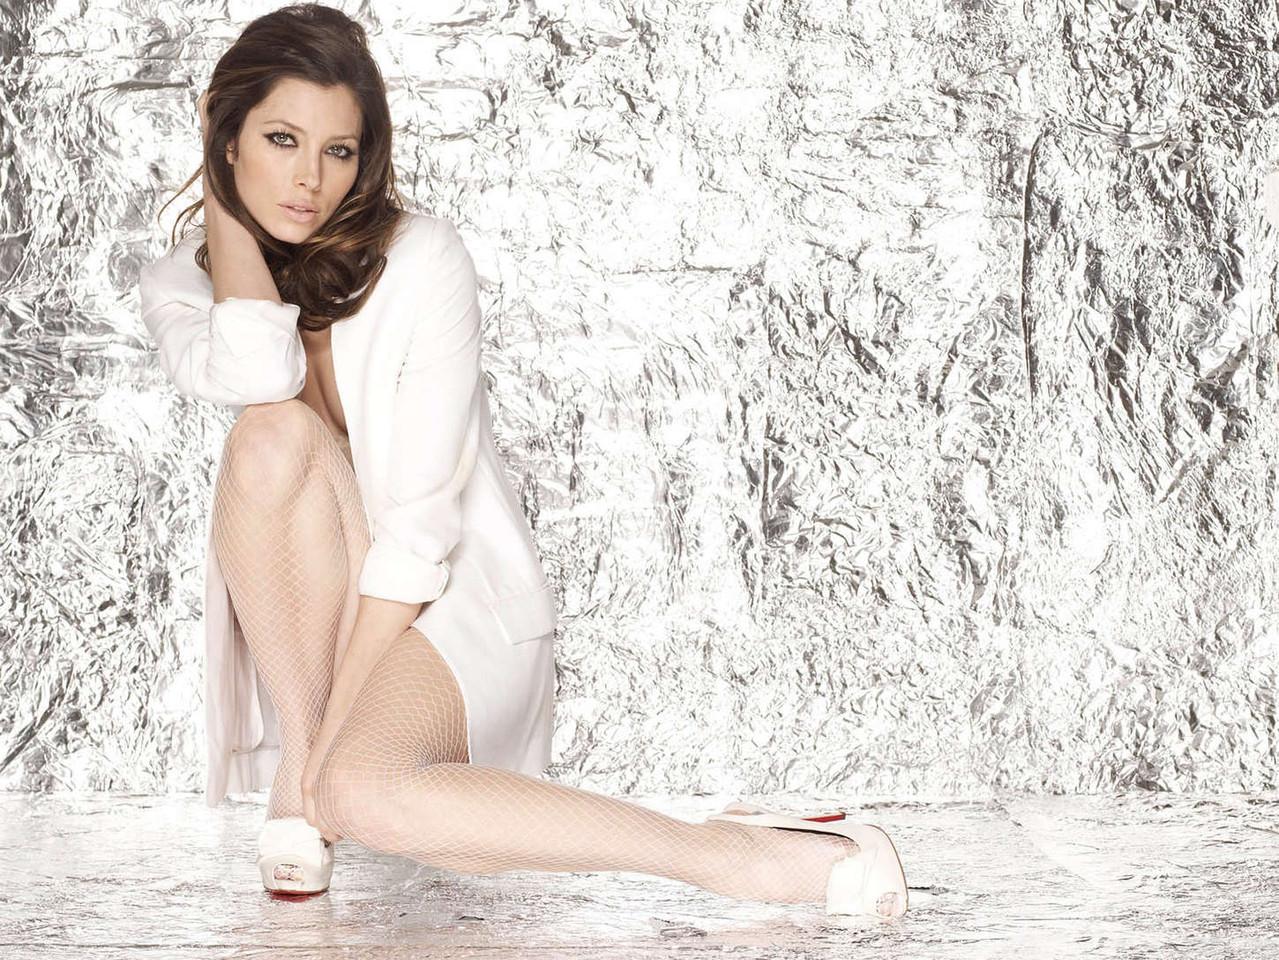 Jessica-Biel--Matthias-Vriens-McGrath-Photoshoot--